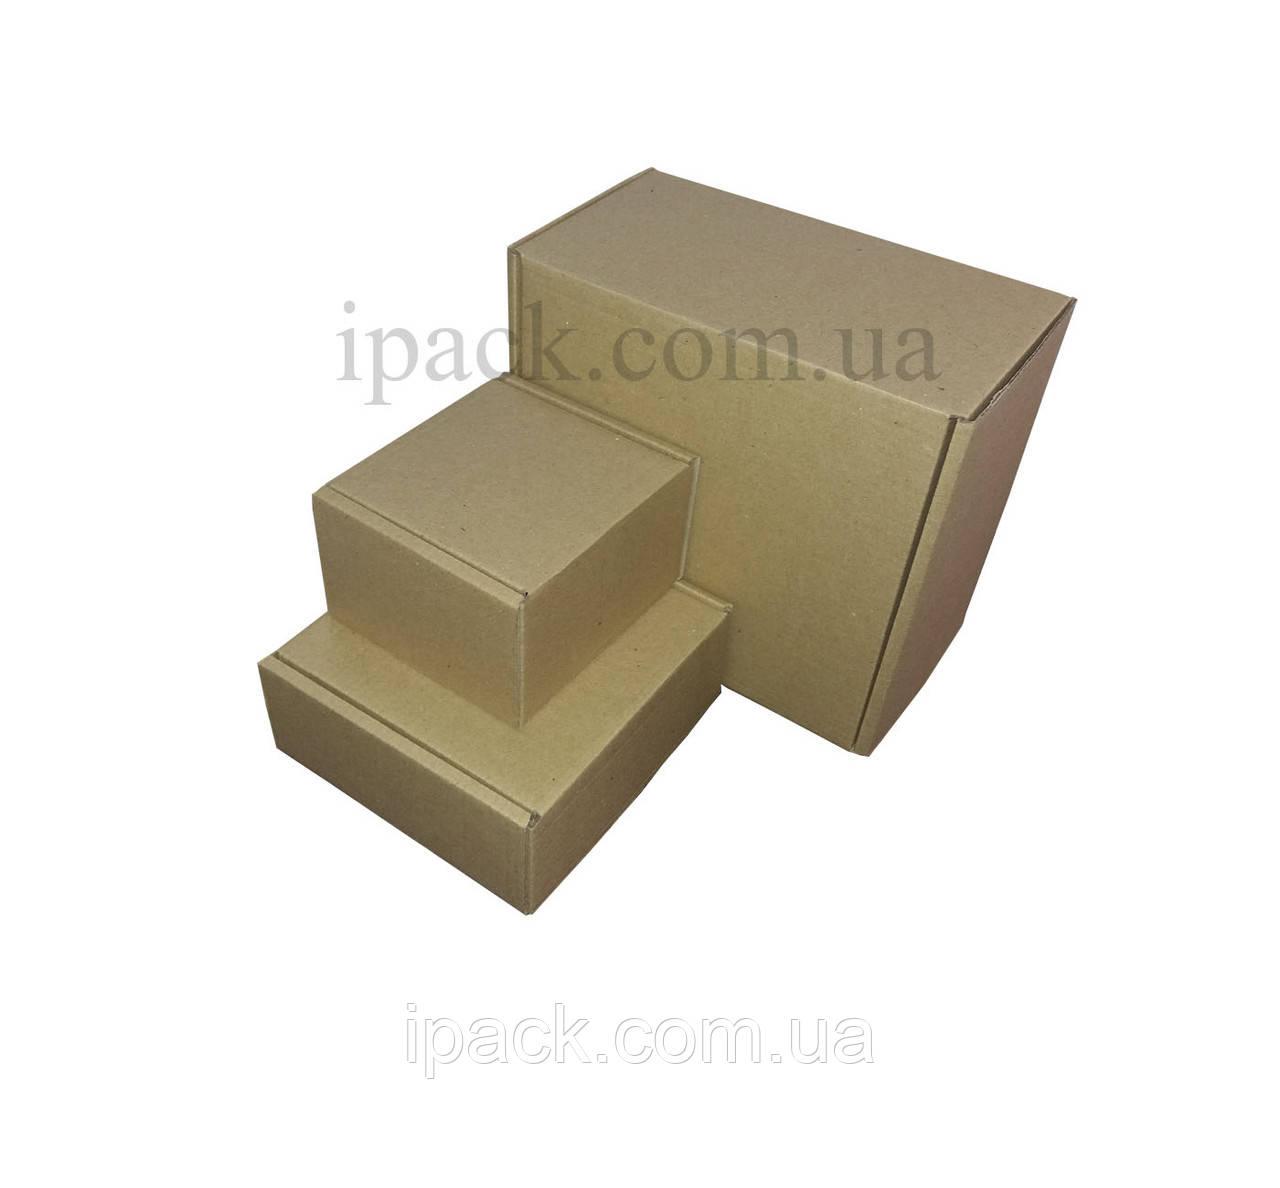 Коробка картонная самосборная, 225*160*50, мм, бурая,  крафт, микрогофрокартон